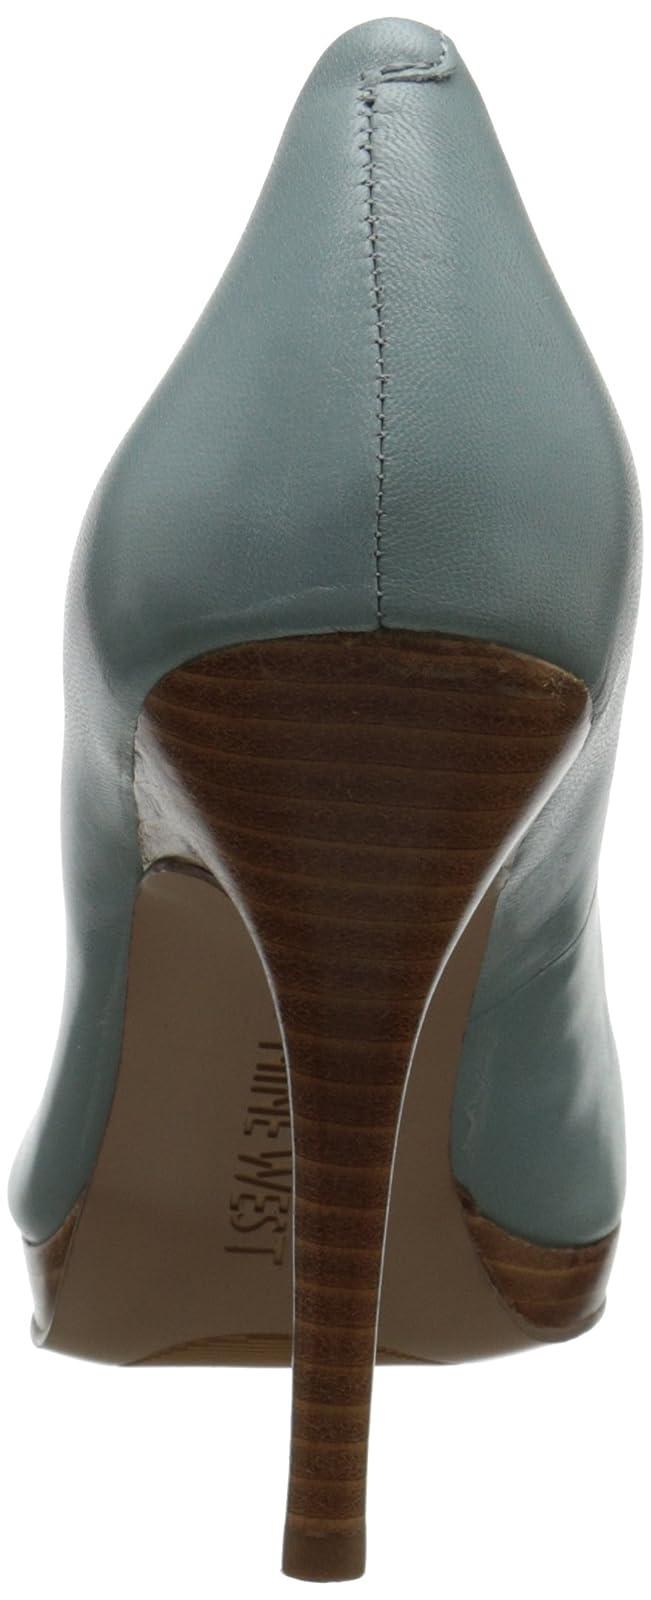 Nine West Women's KRISTAL Leather Dress Pump 5 M US - 2